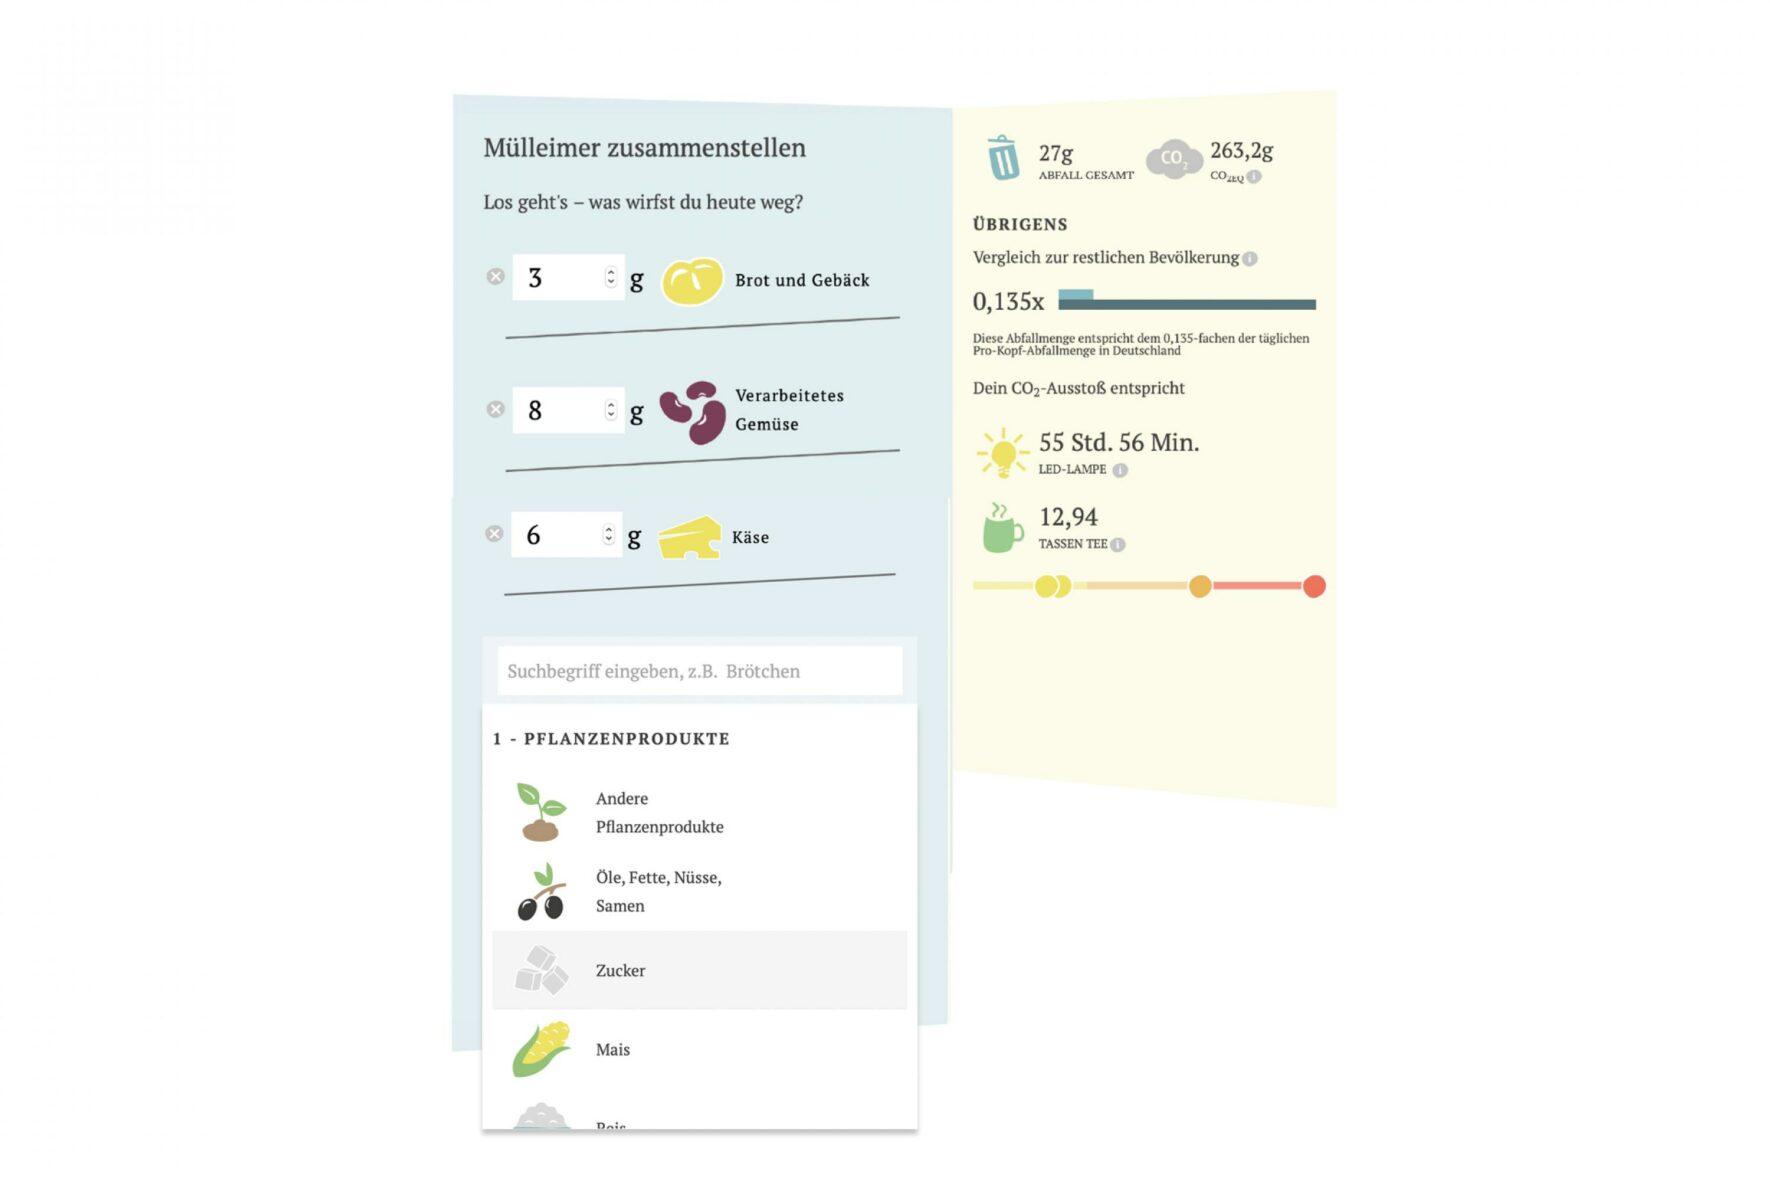 Klimarechner-Icons-FoodLabHome-Food-waste-tracker-FORMLOS-Berlin-Icons-Gestaltung-6